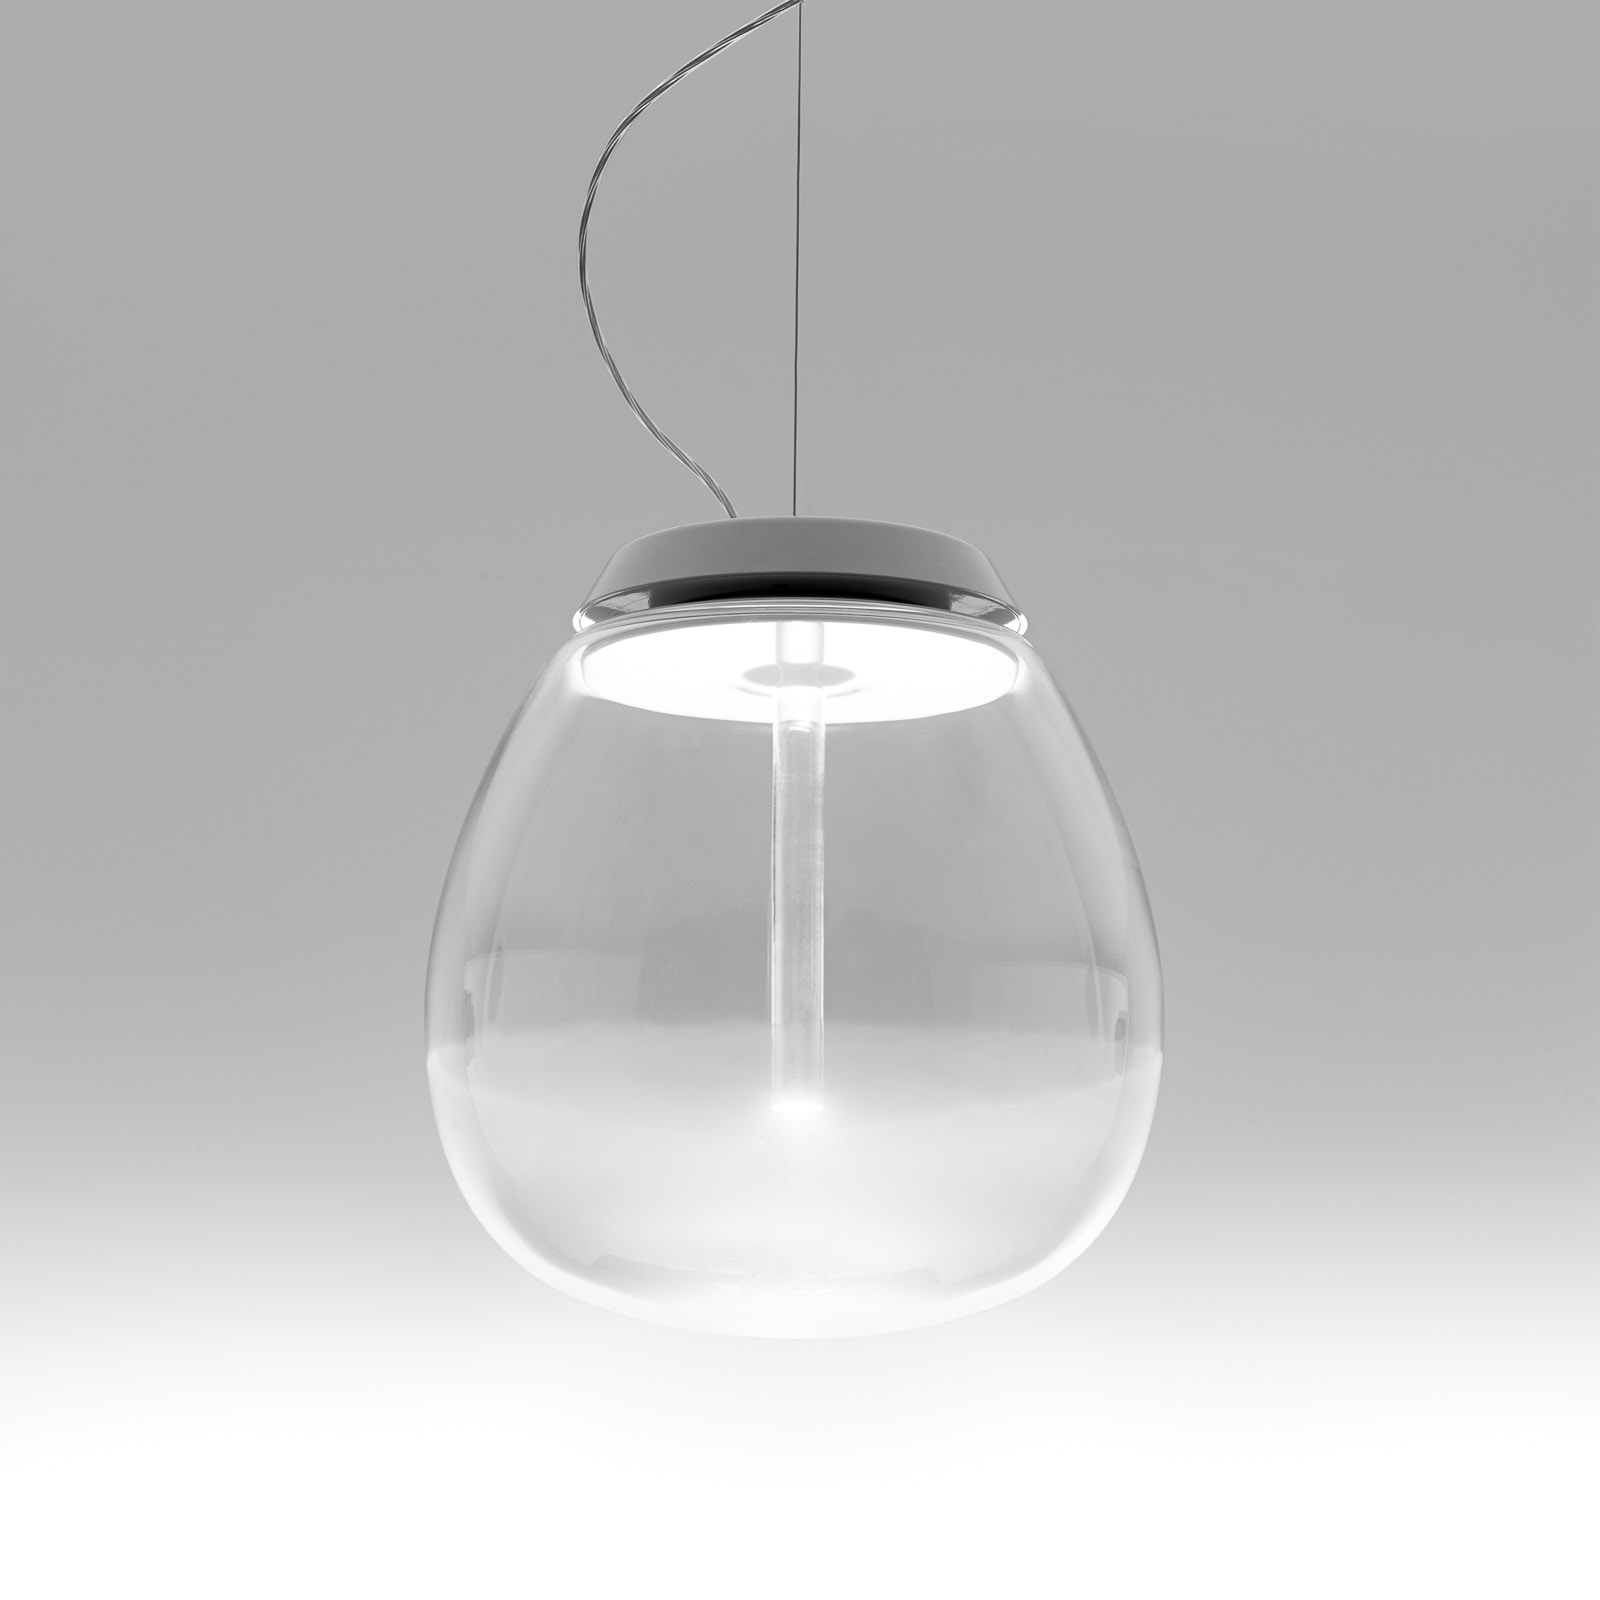 Artemide Empatia LED-Hängeleuchte, Ø 16 cm